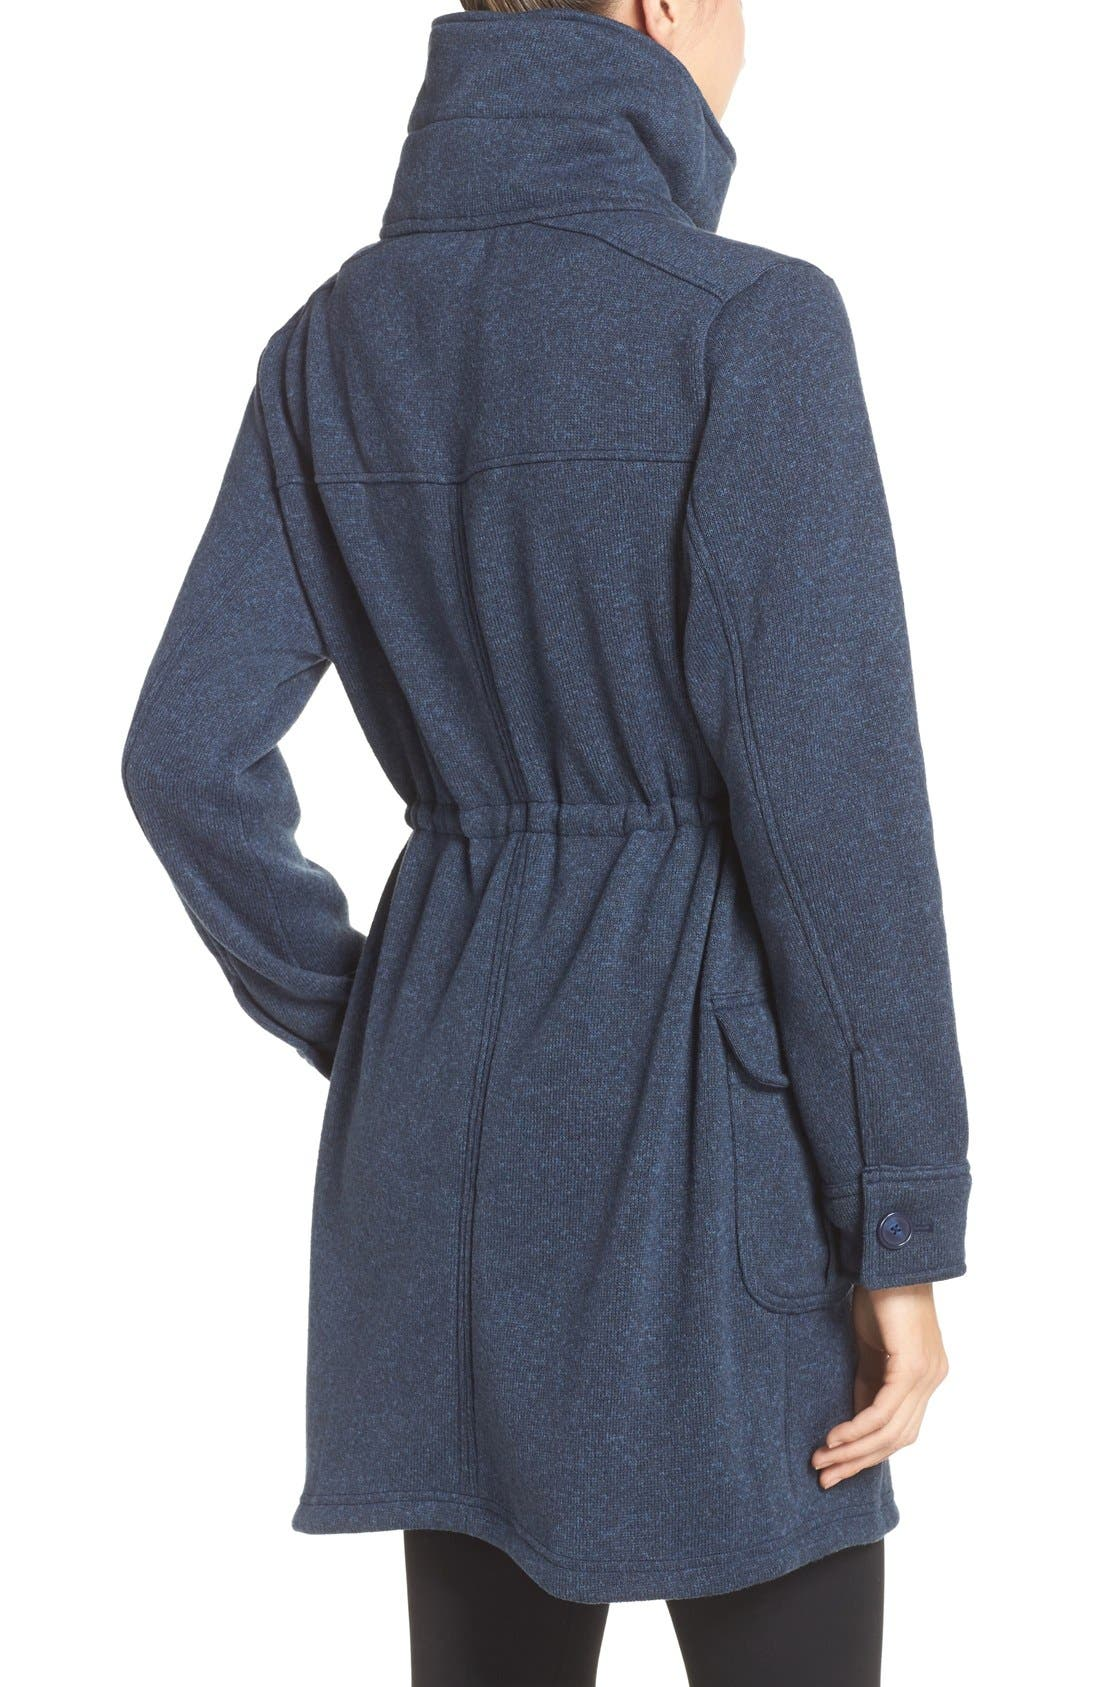 'Better Sweater<sup>®</sup>' Fleece Coat,                             Alternate thumbnail 2, color,                             Classic Navy